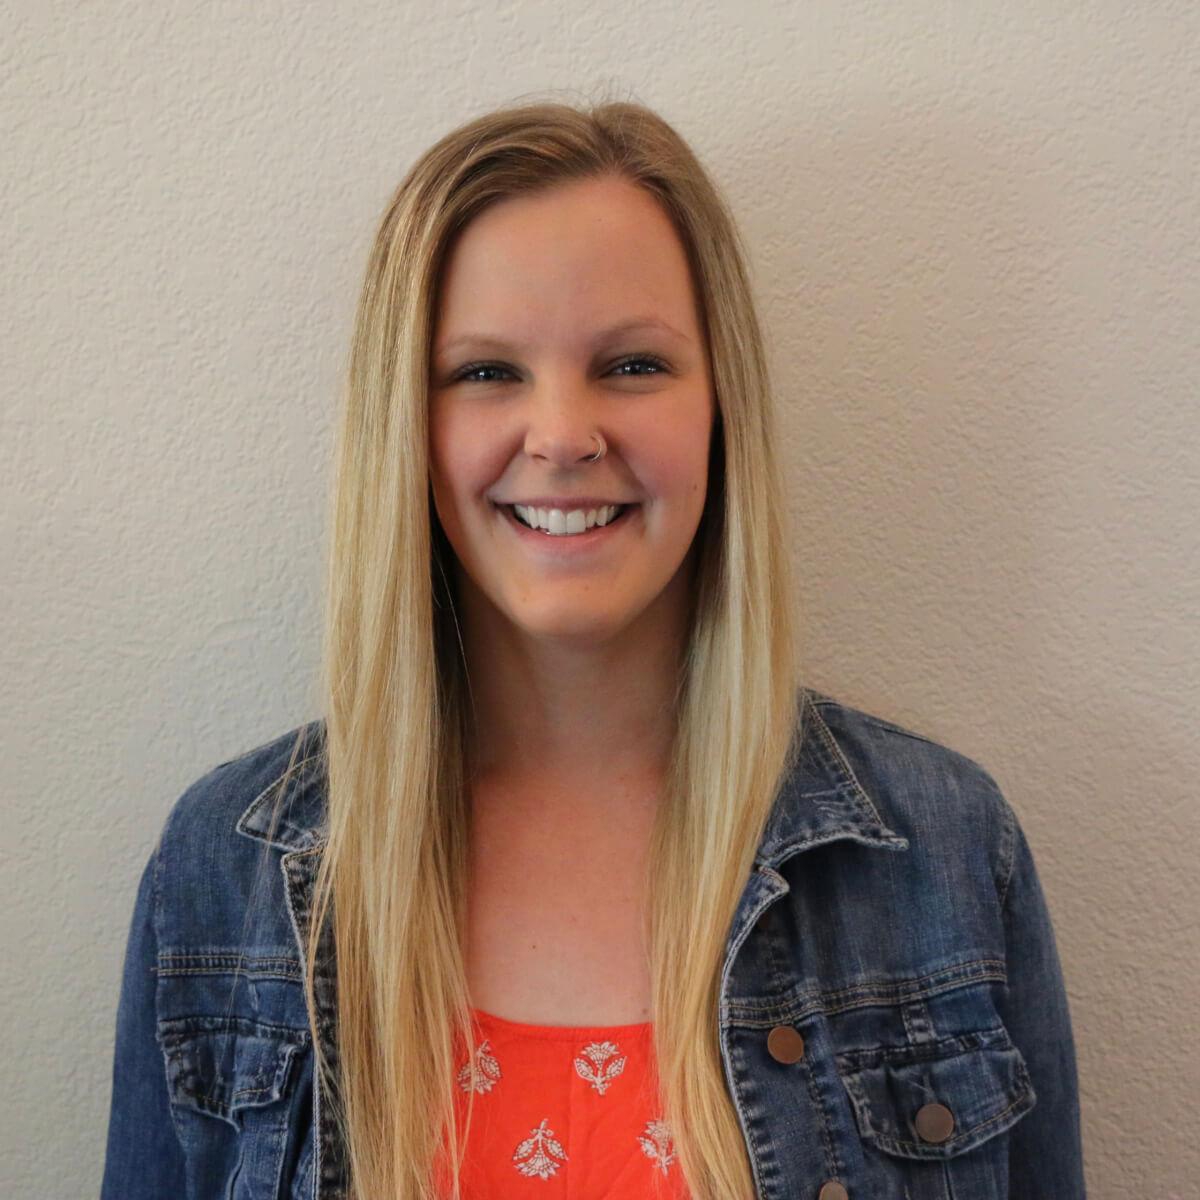 Meet Sydney Collins, Camp ANV's Camp Manager!